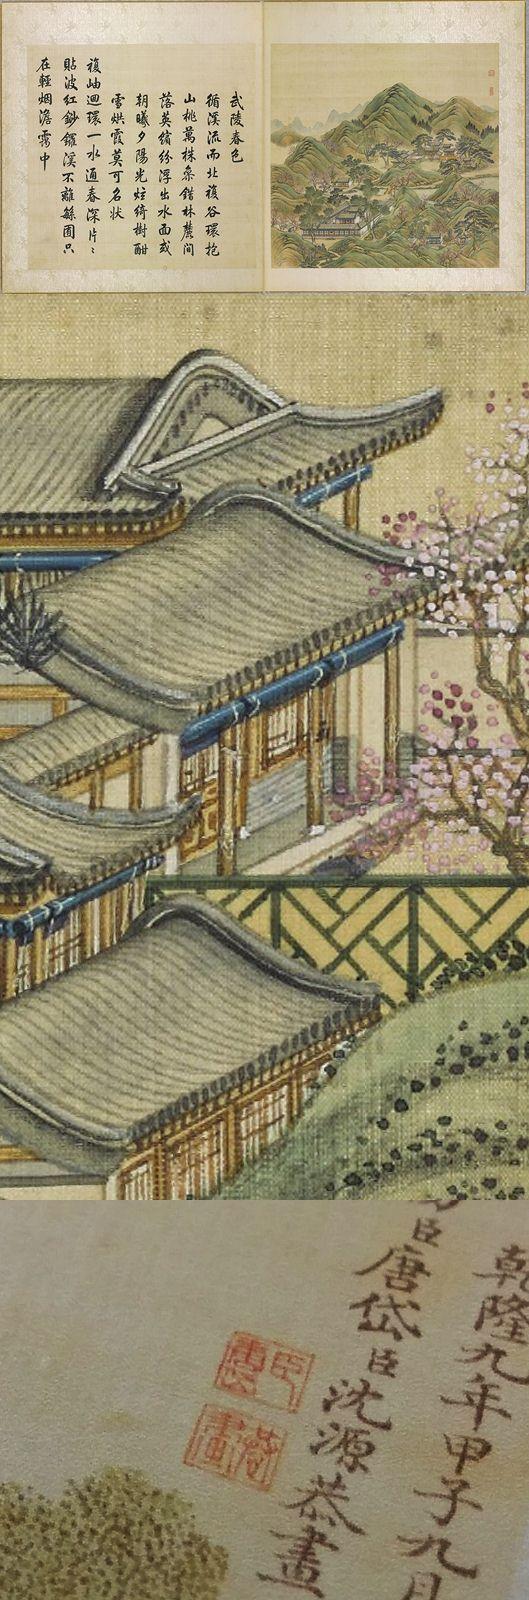 yuanmingyuangaoqingall